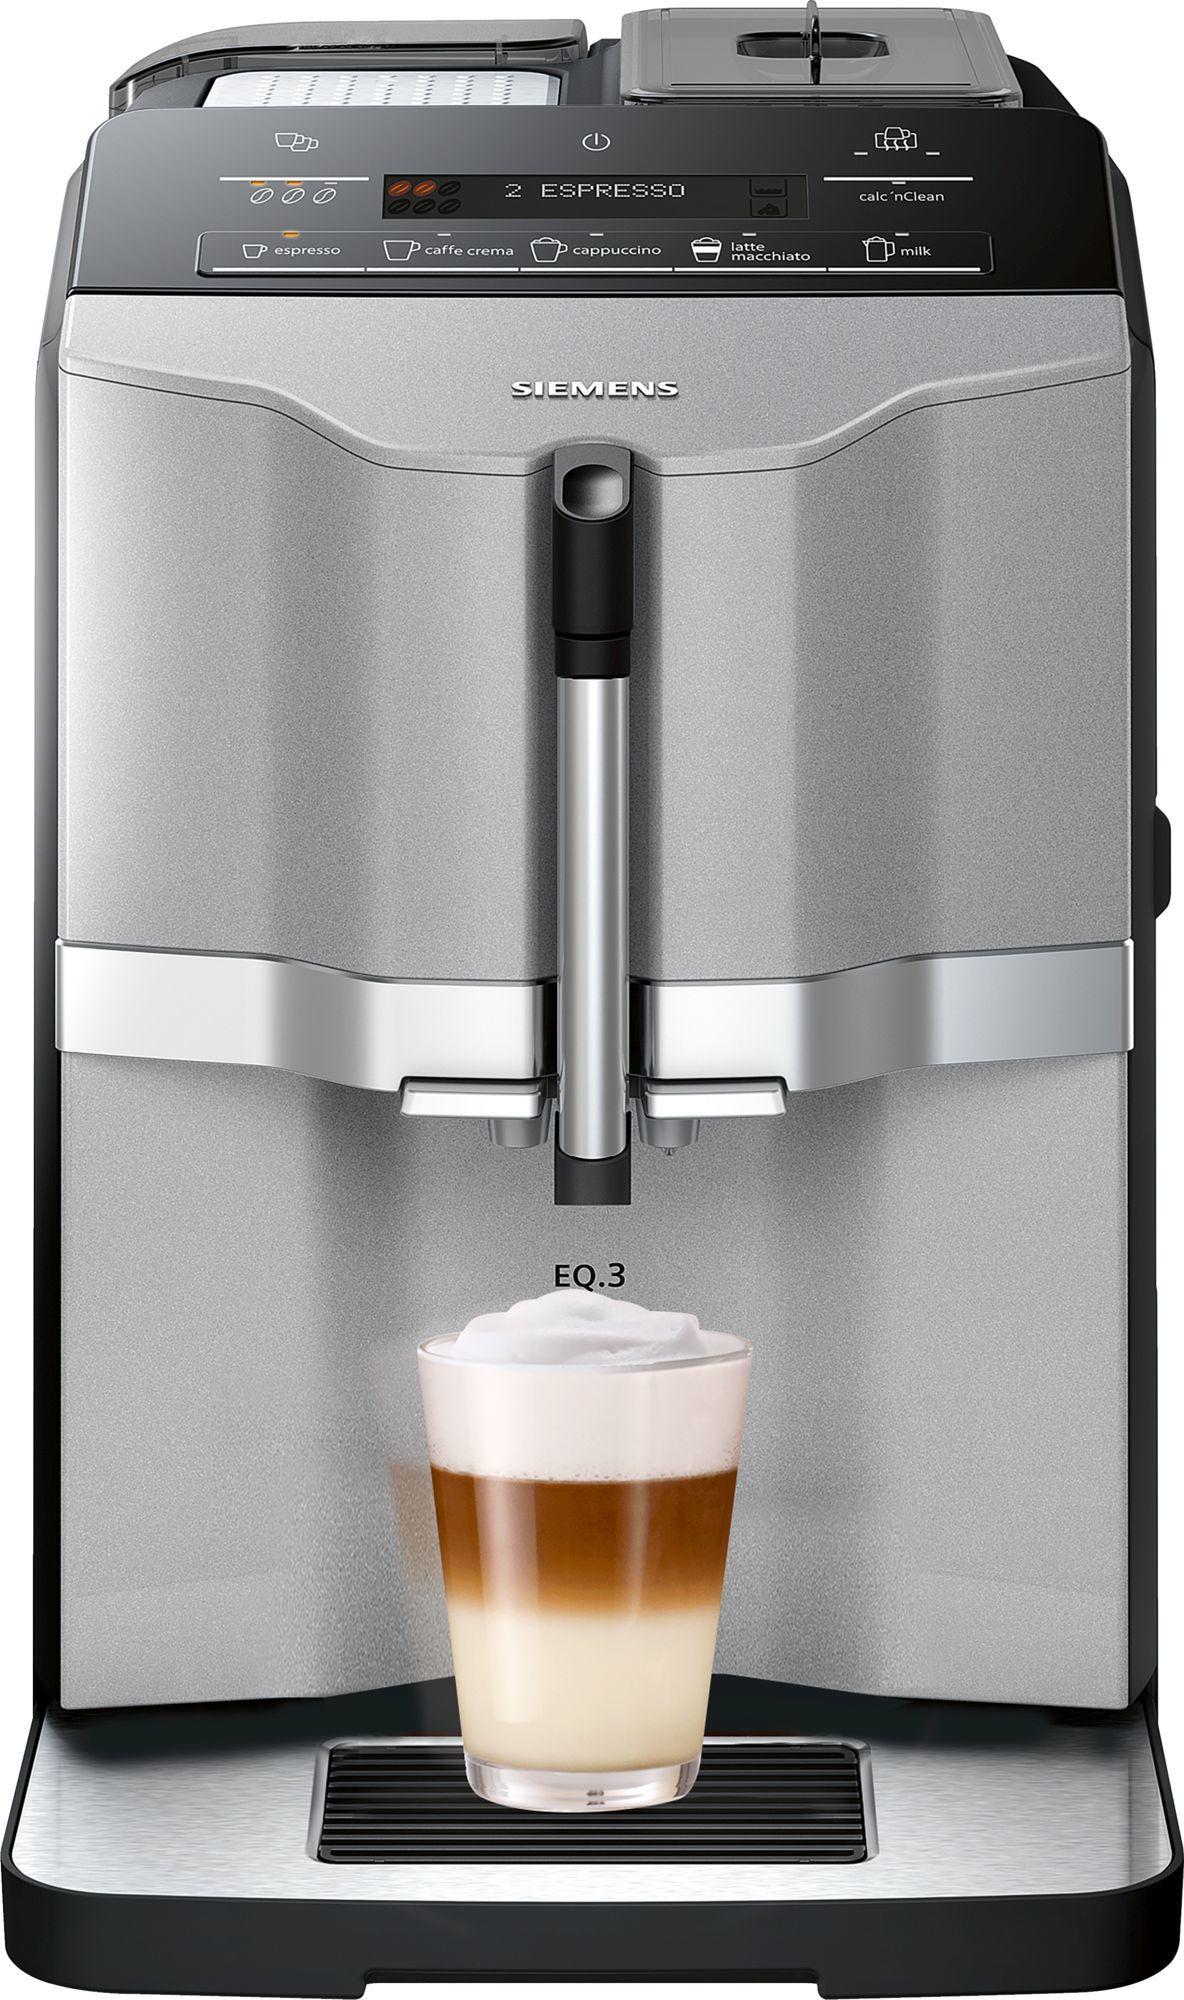 Image of TI303203RW EQ.3 s300 Fully Automatic Coffee Machine